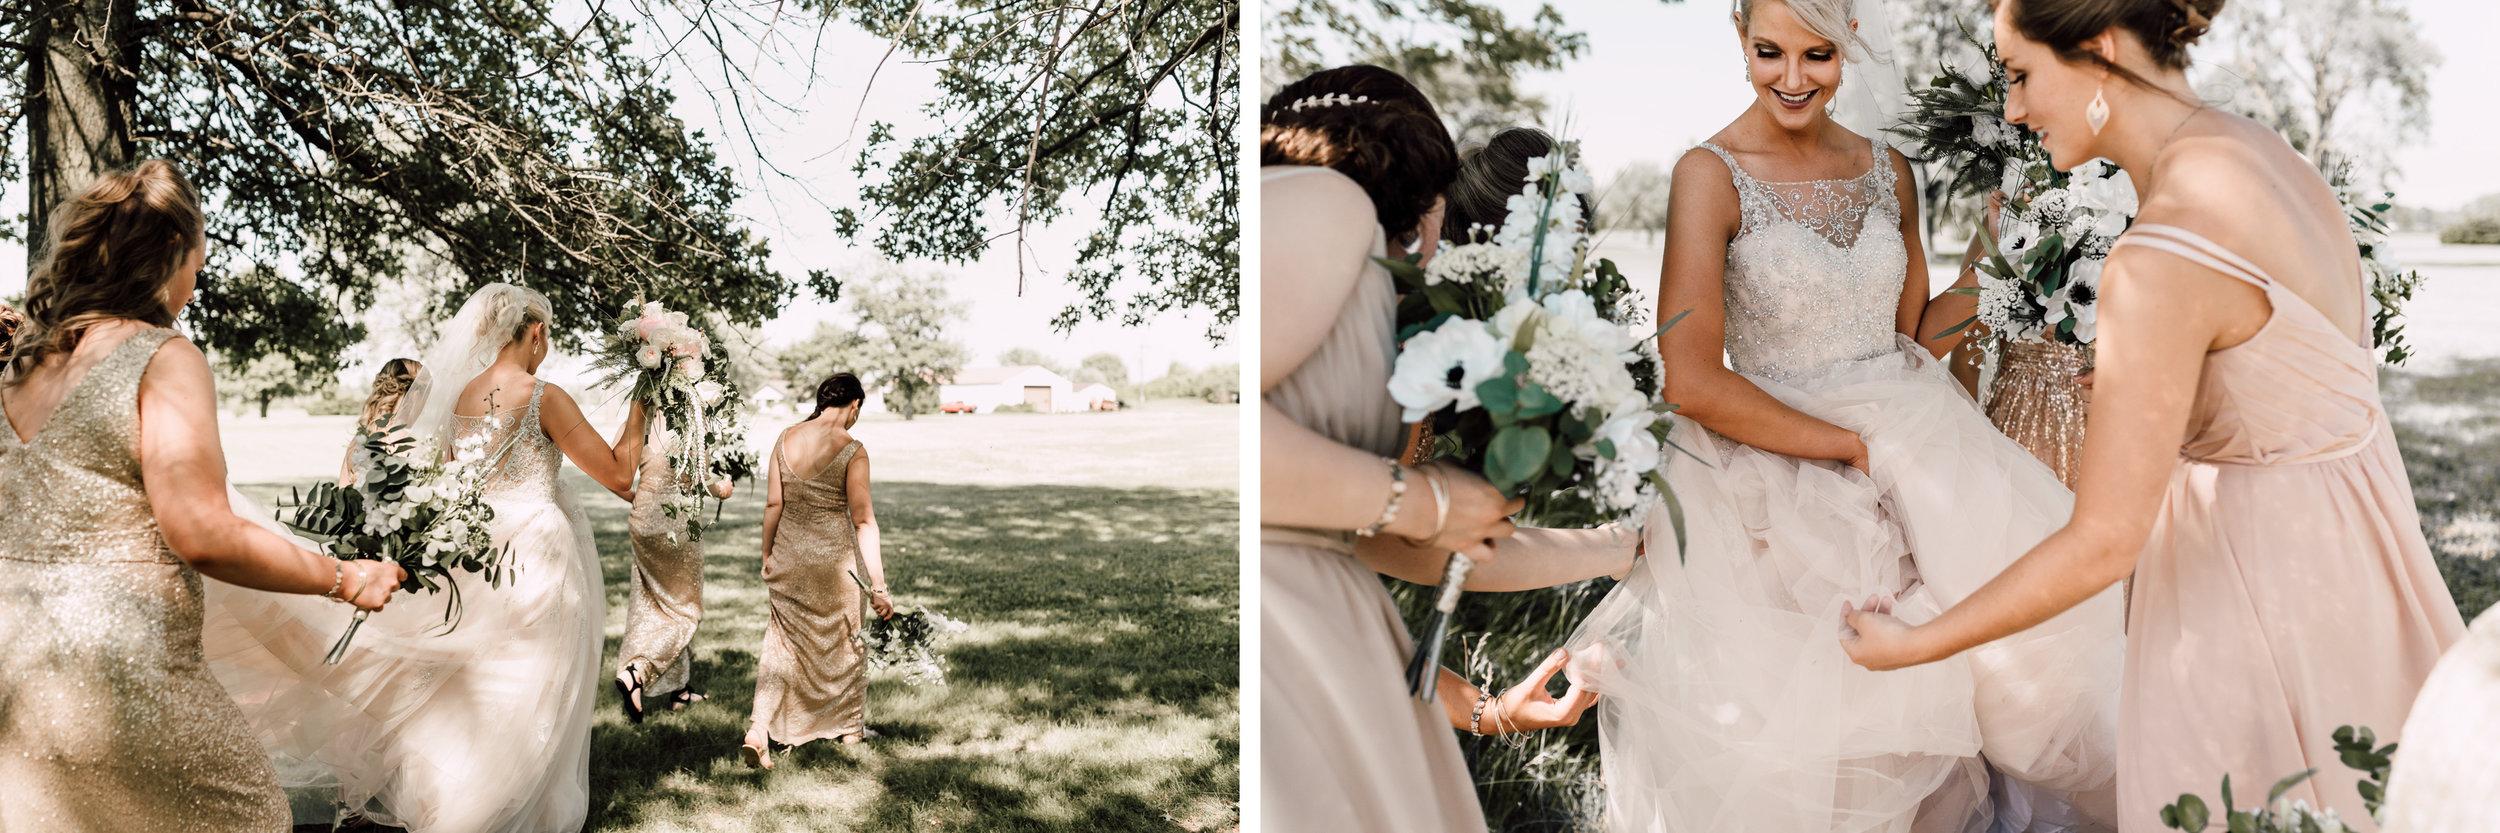 bridal portraits, bridesmaid dress ideas